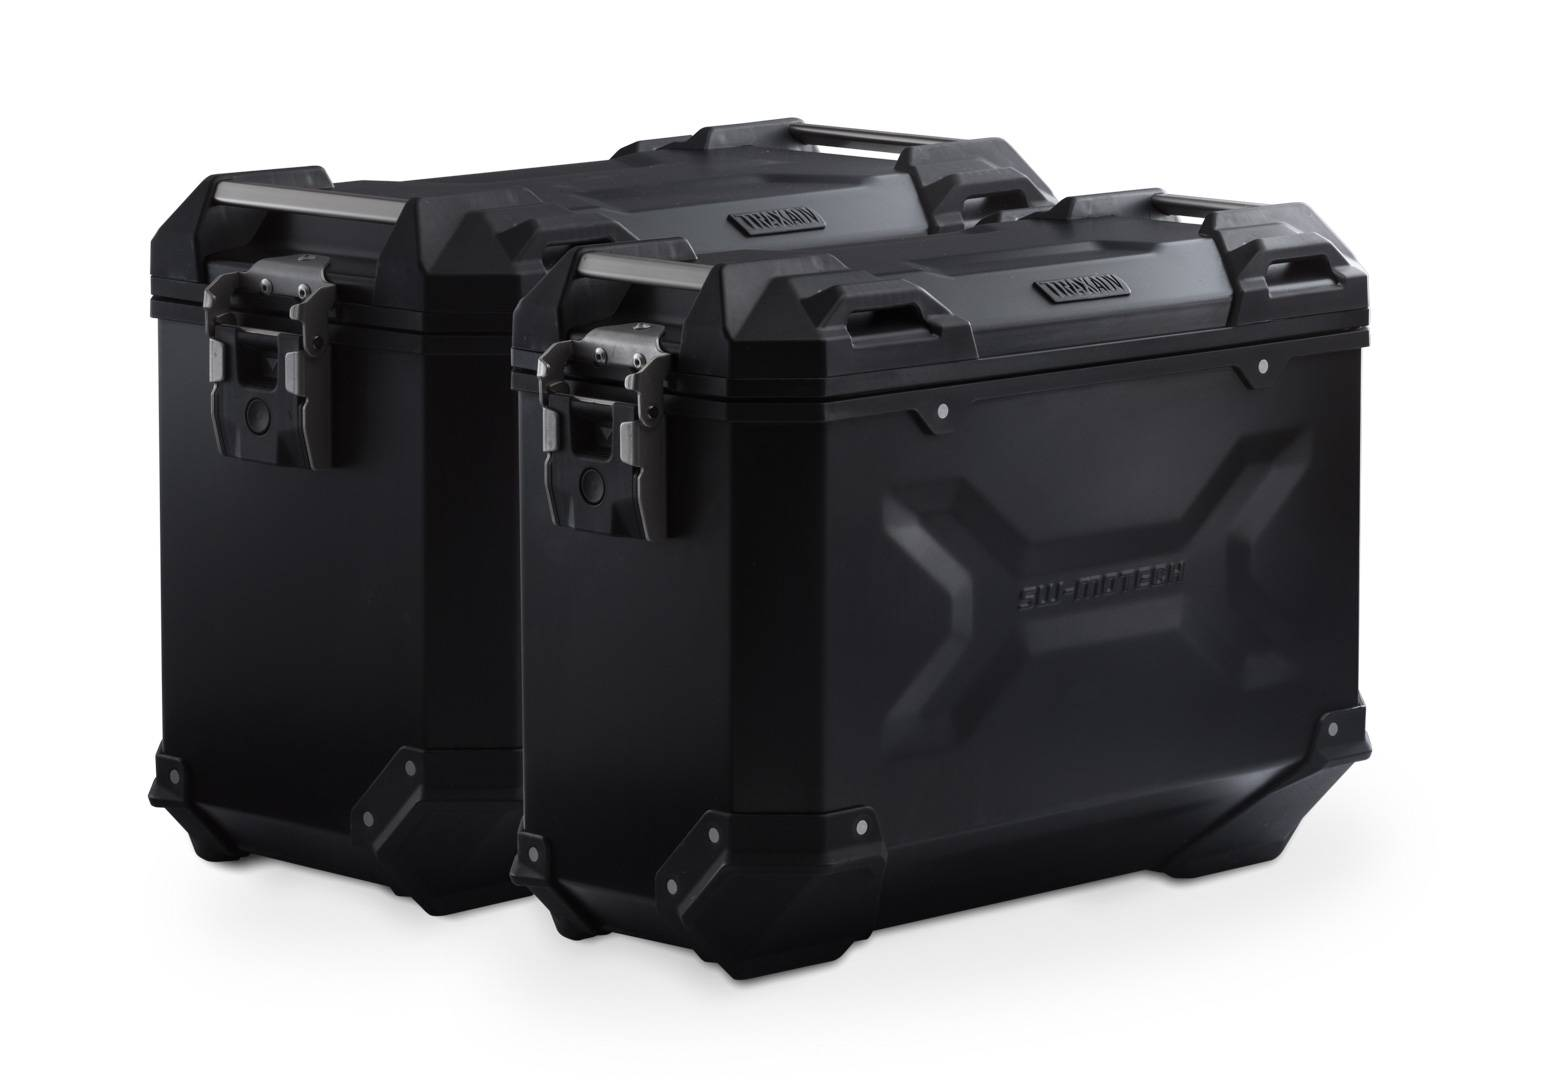 SW-Motech Sistema de maletas TRAX ADV - Negro. 45/37 l. BMW F750GS, F850GS/Adv (17-).